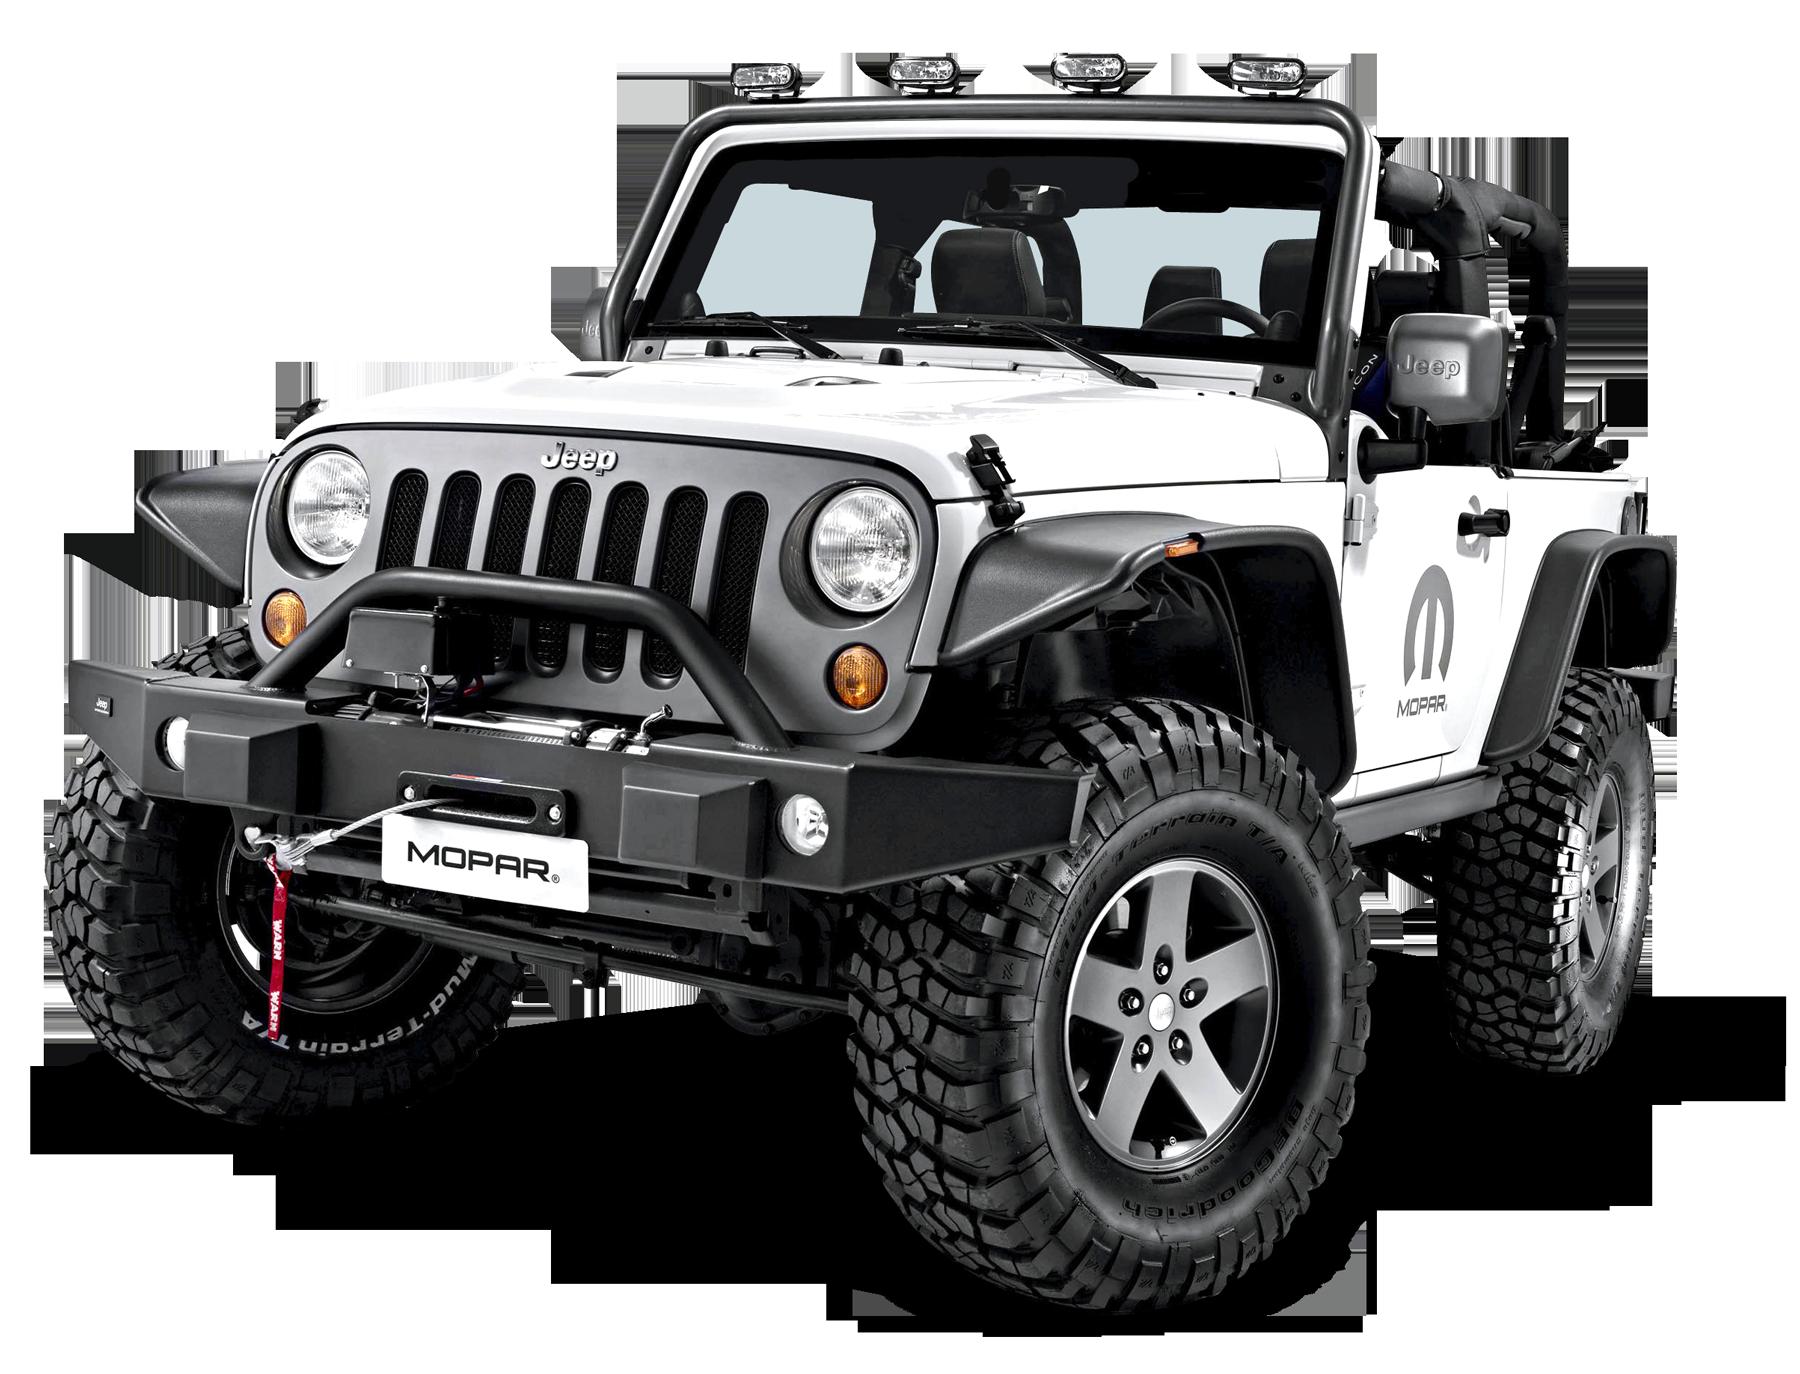 Jeep Wrangler Car Wrangler Car Jeep Wallpaper 2015 Jeep Wrangler Unlimited